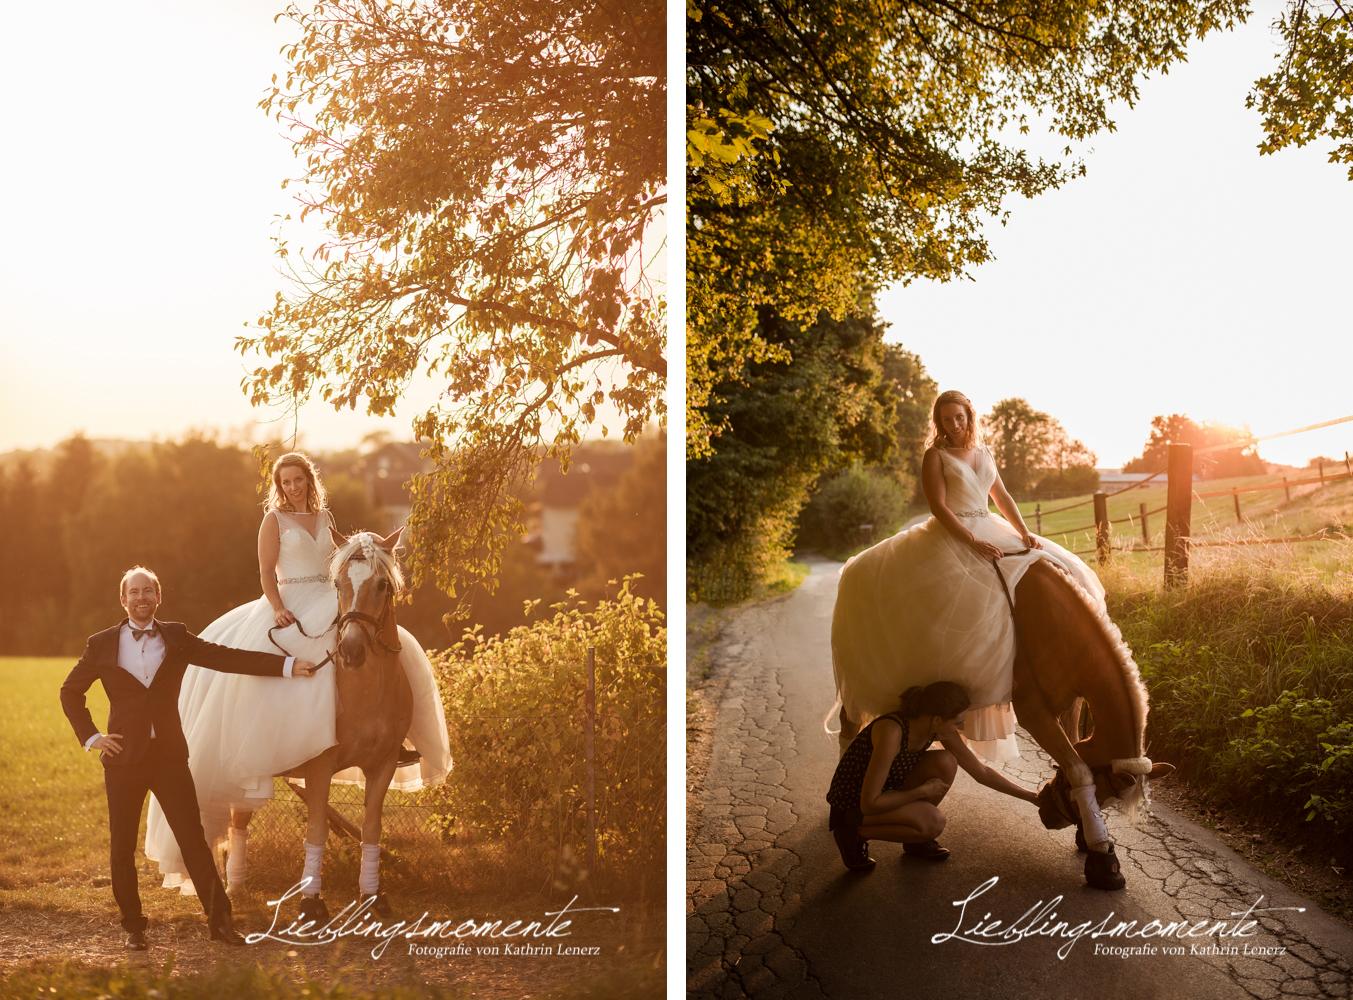 Hochzeit_pferd_ratingen_duesseldorf_fotograf (39)